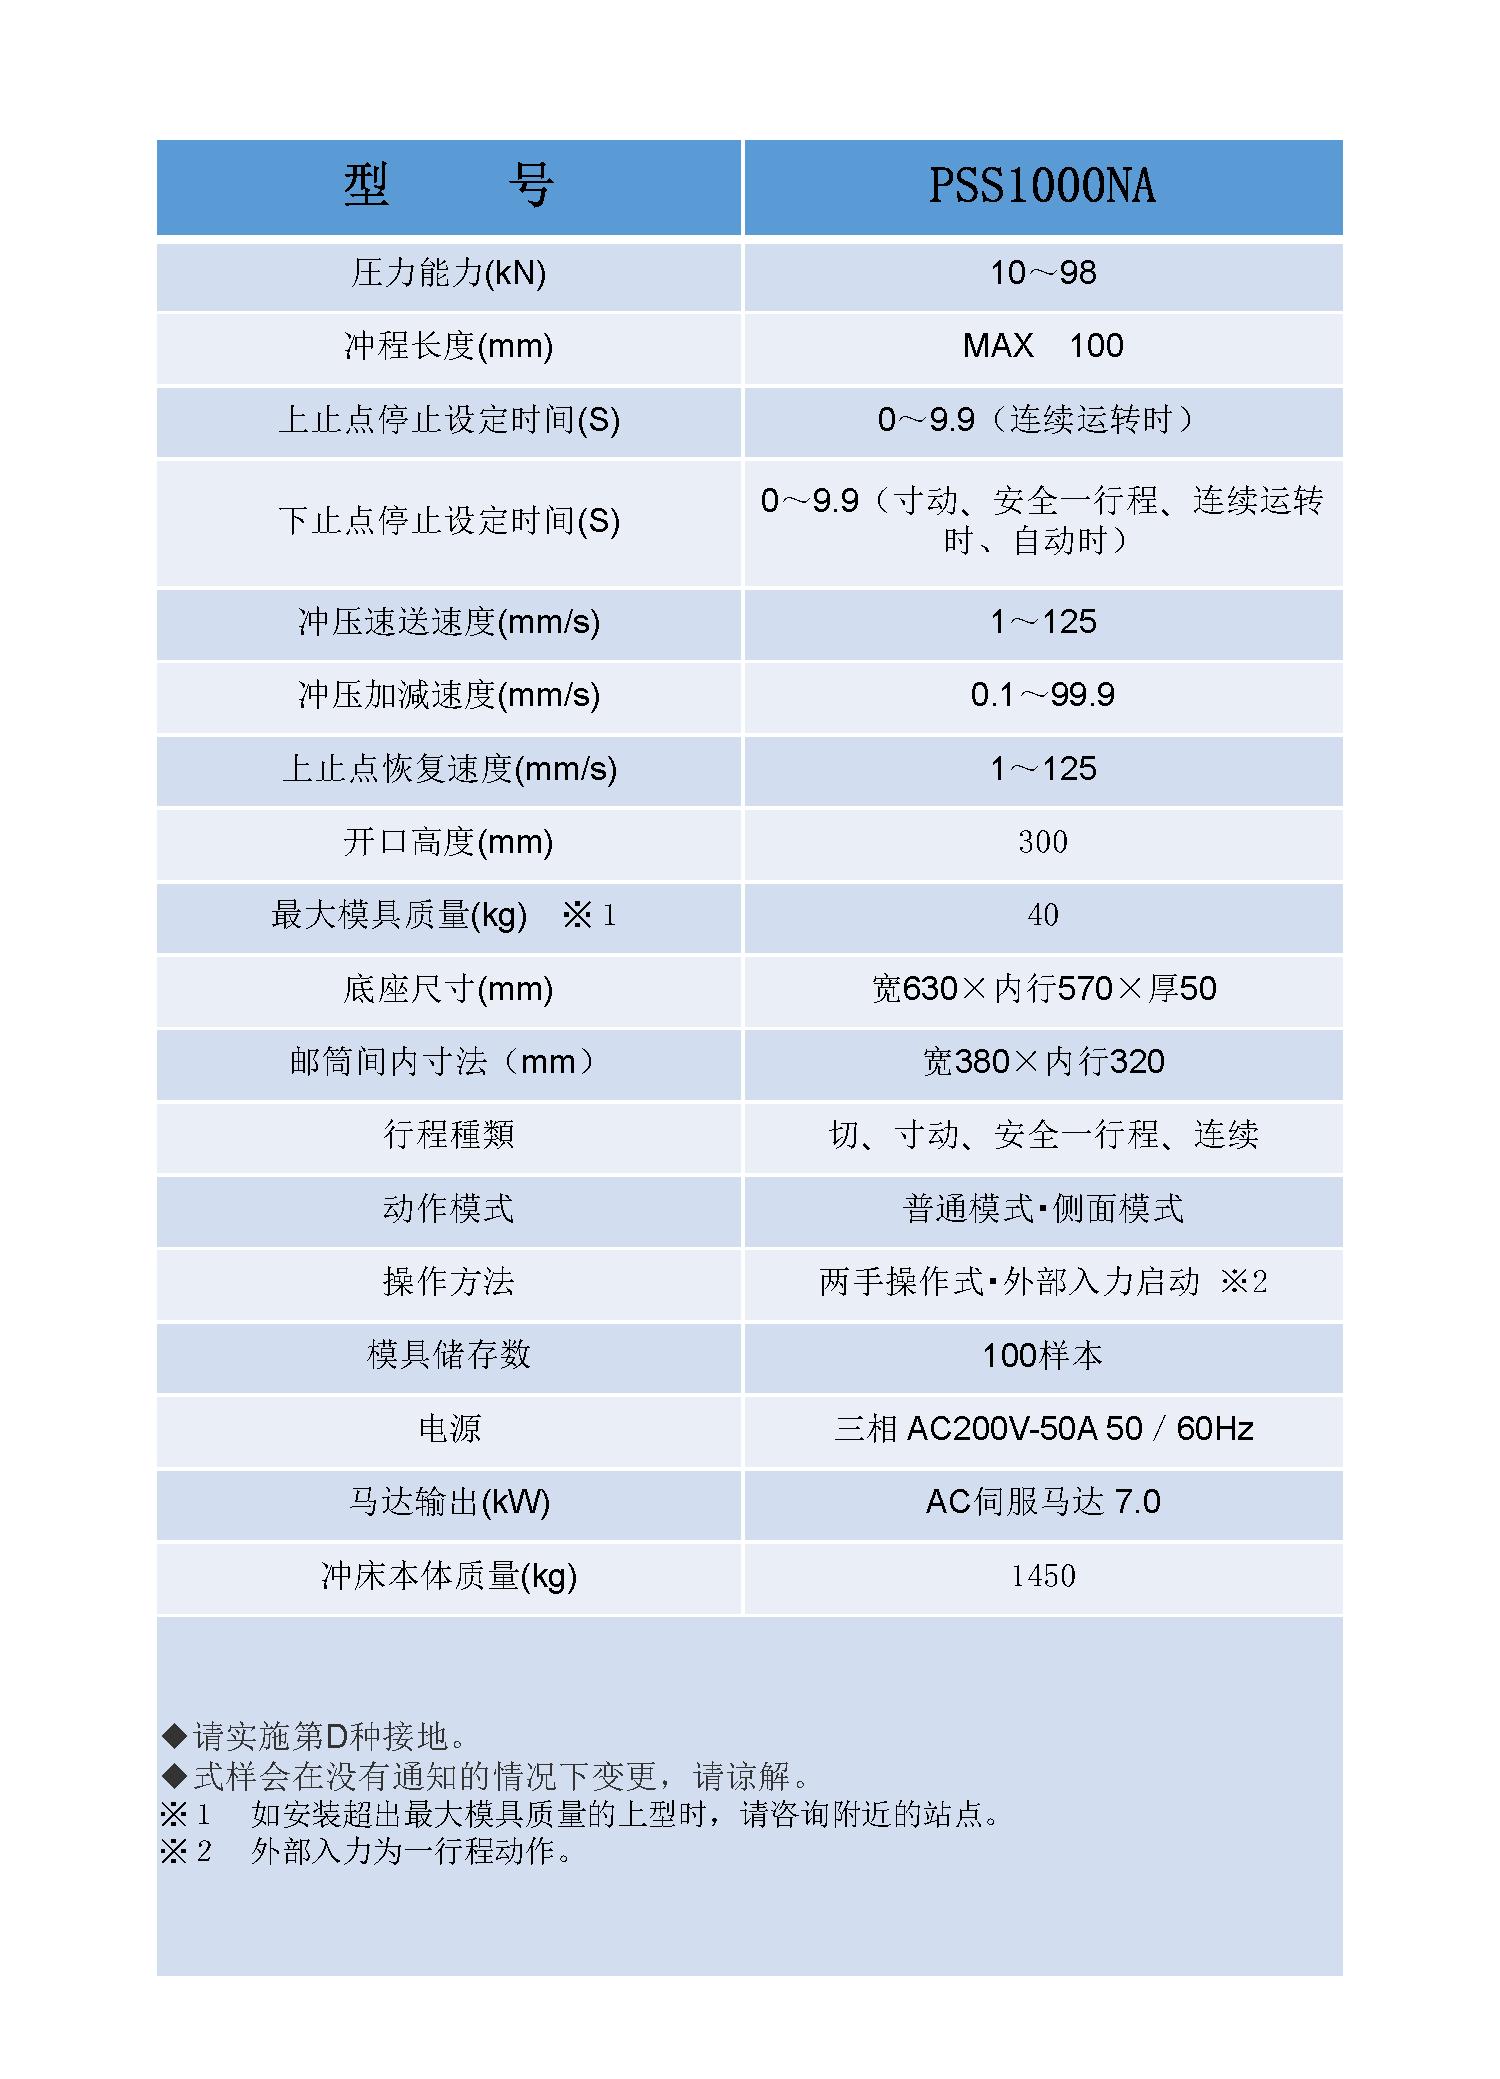 PSS1000NA_仕様 - 中文.png